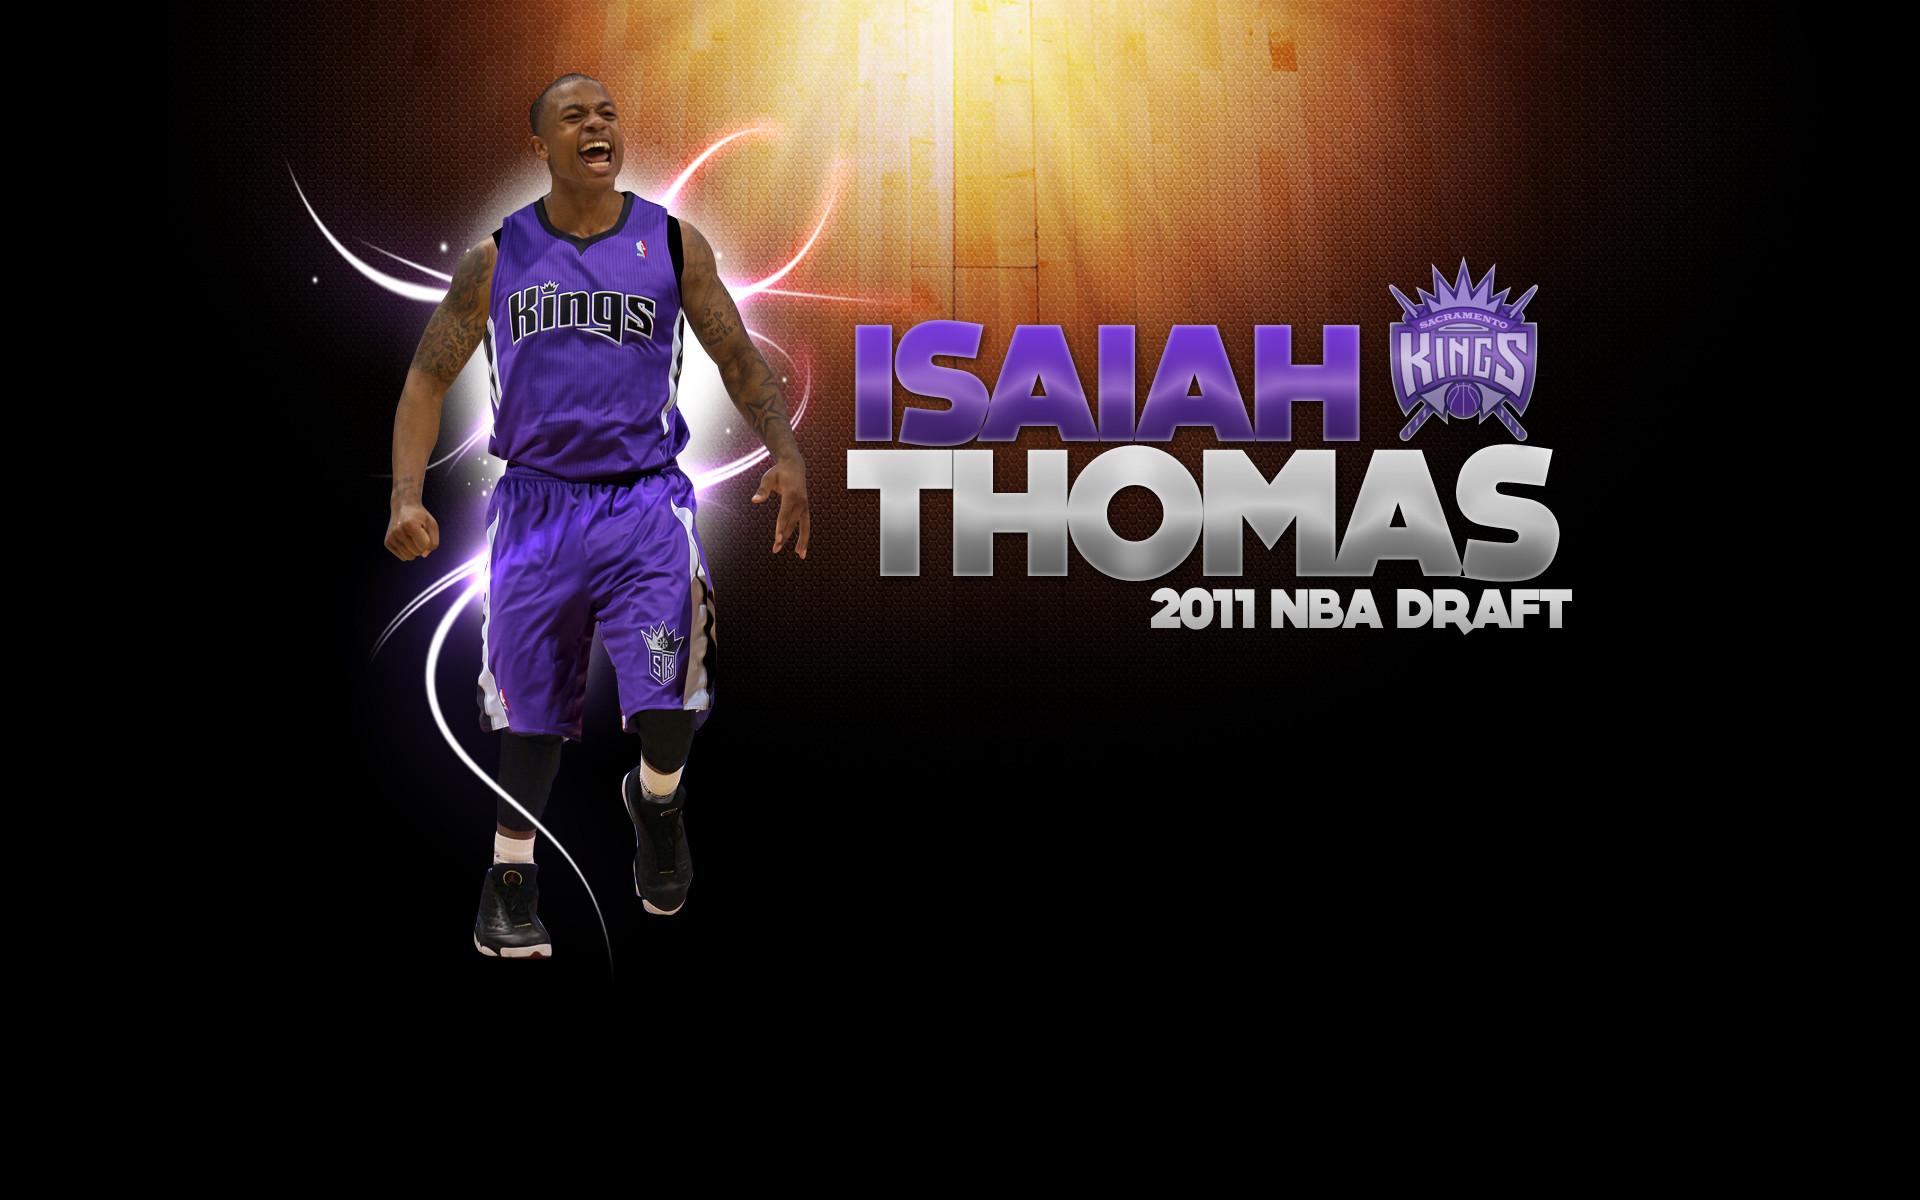 Kings Wallpaper: Isaiah Thomas